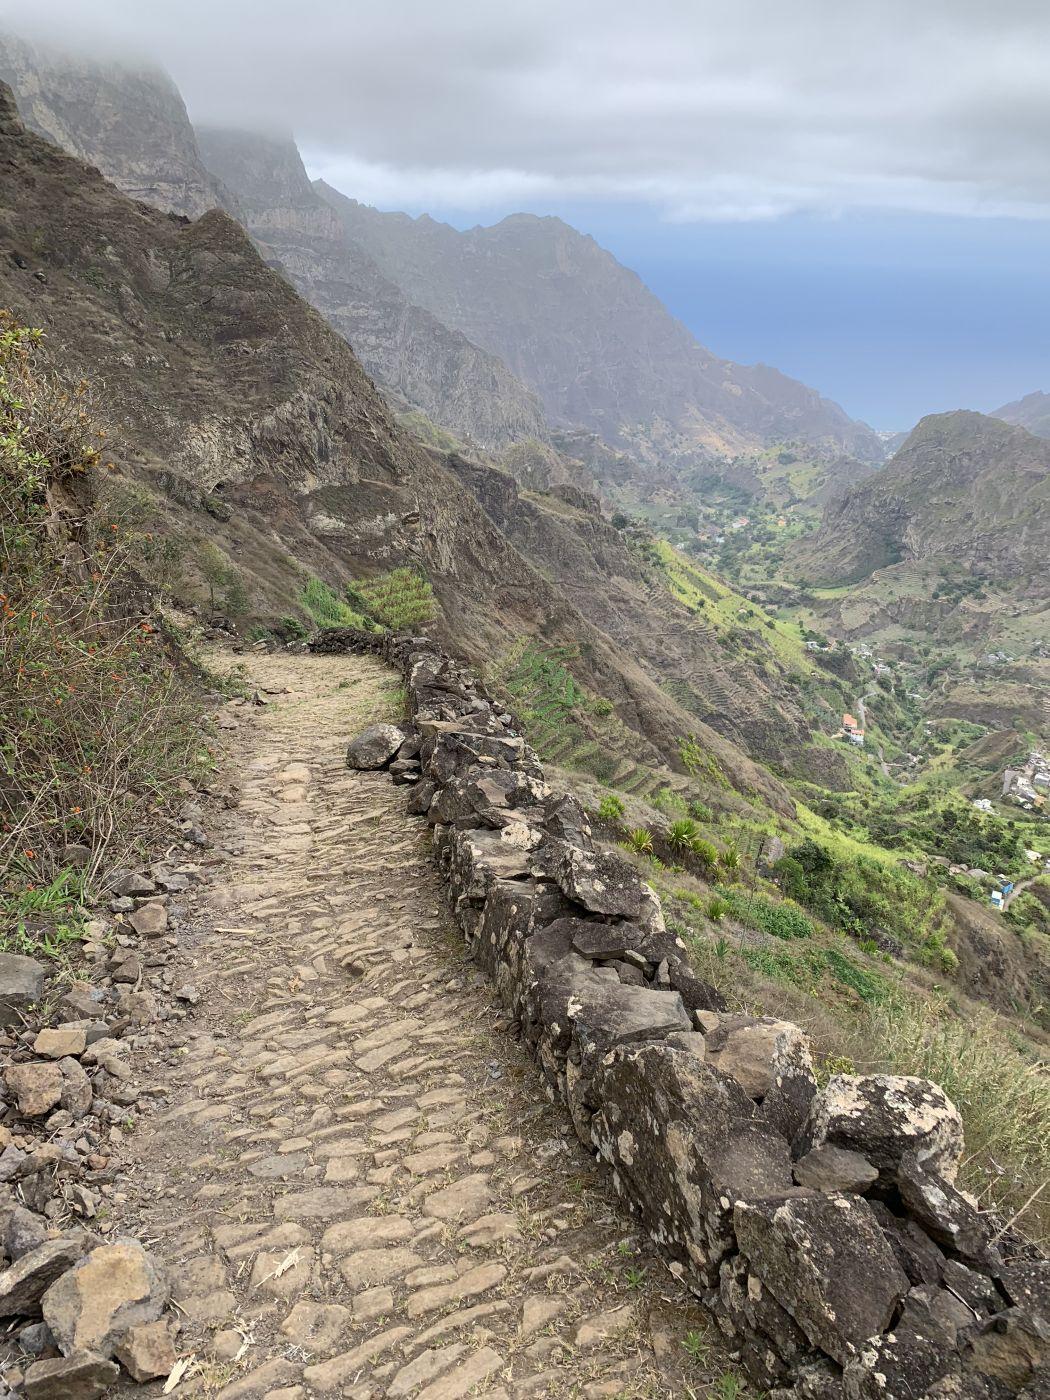 Vale do Paul (Paul Valley), Cape Verde